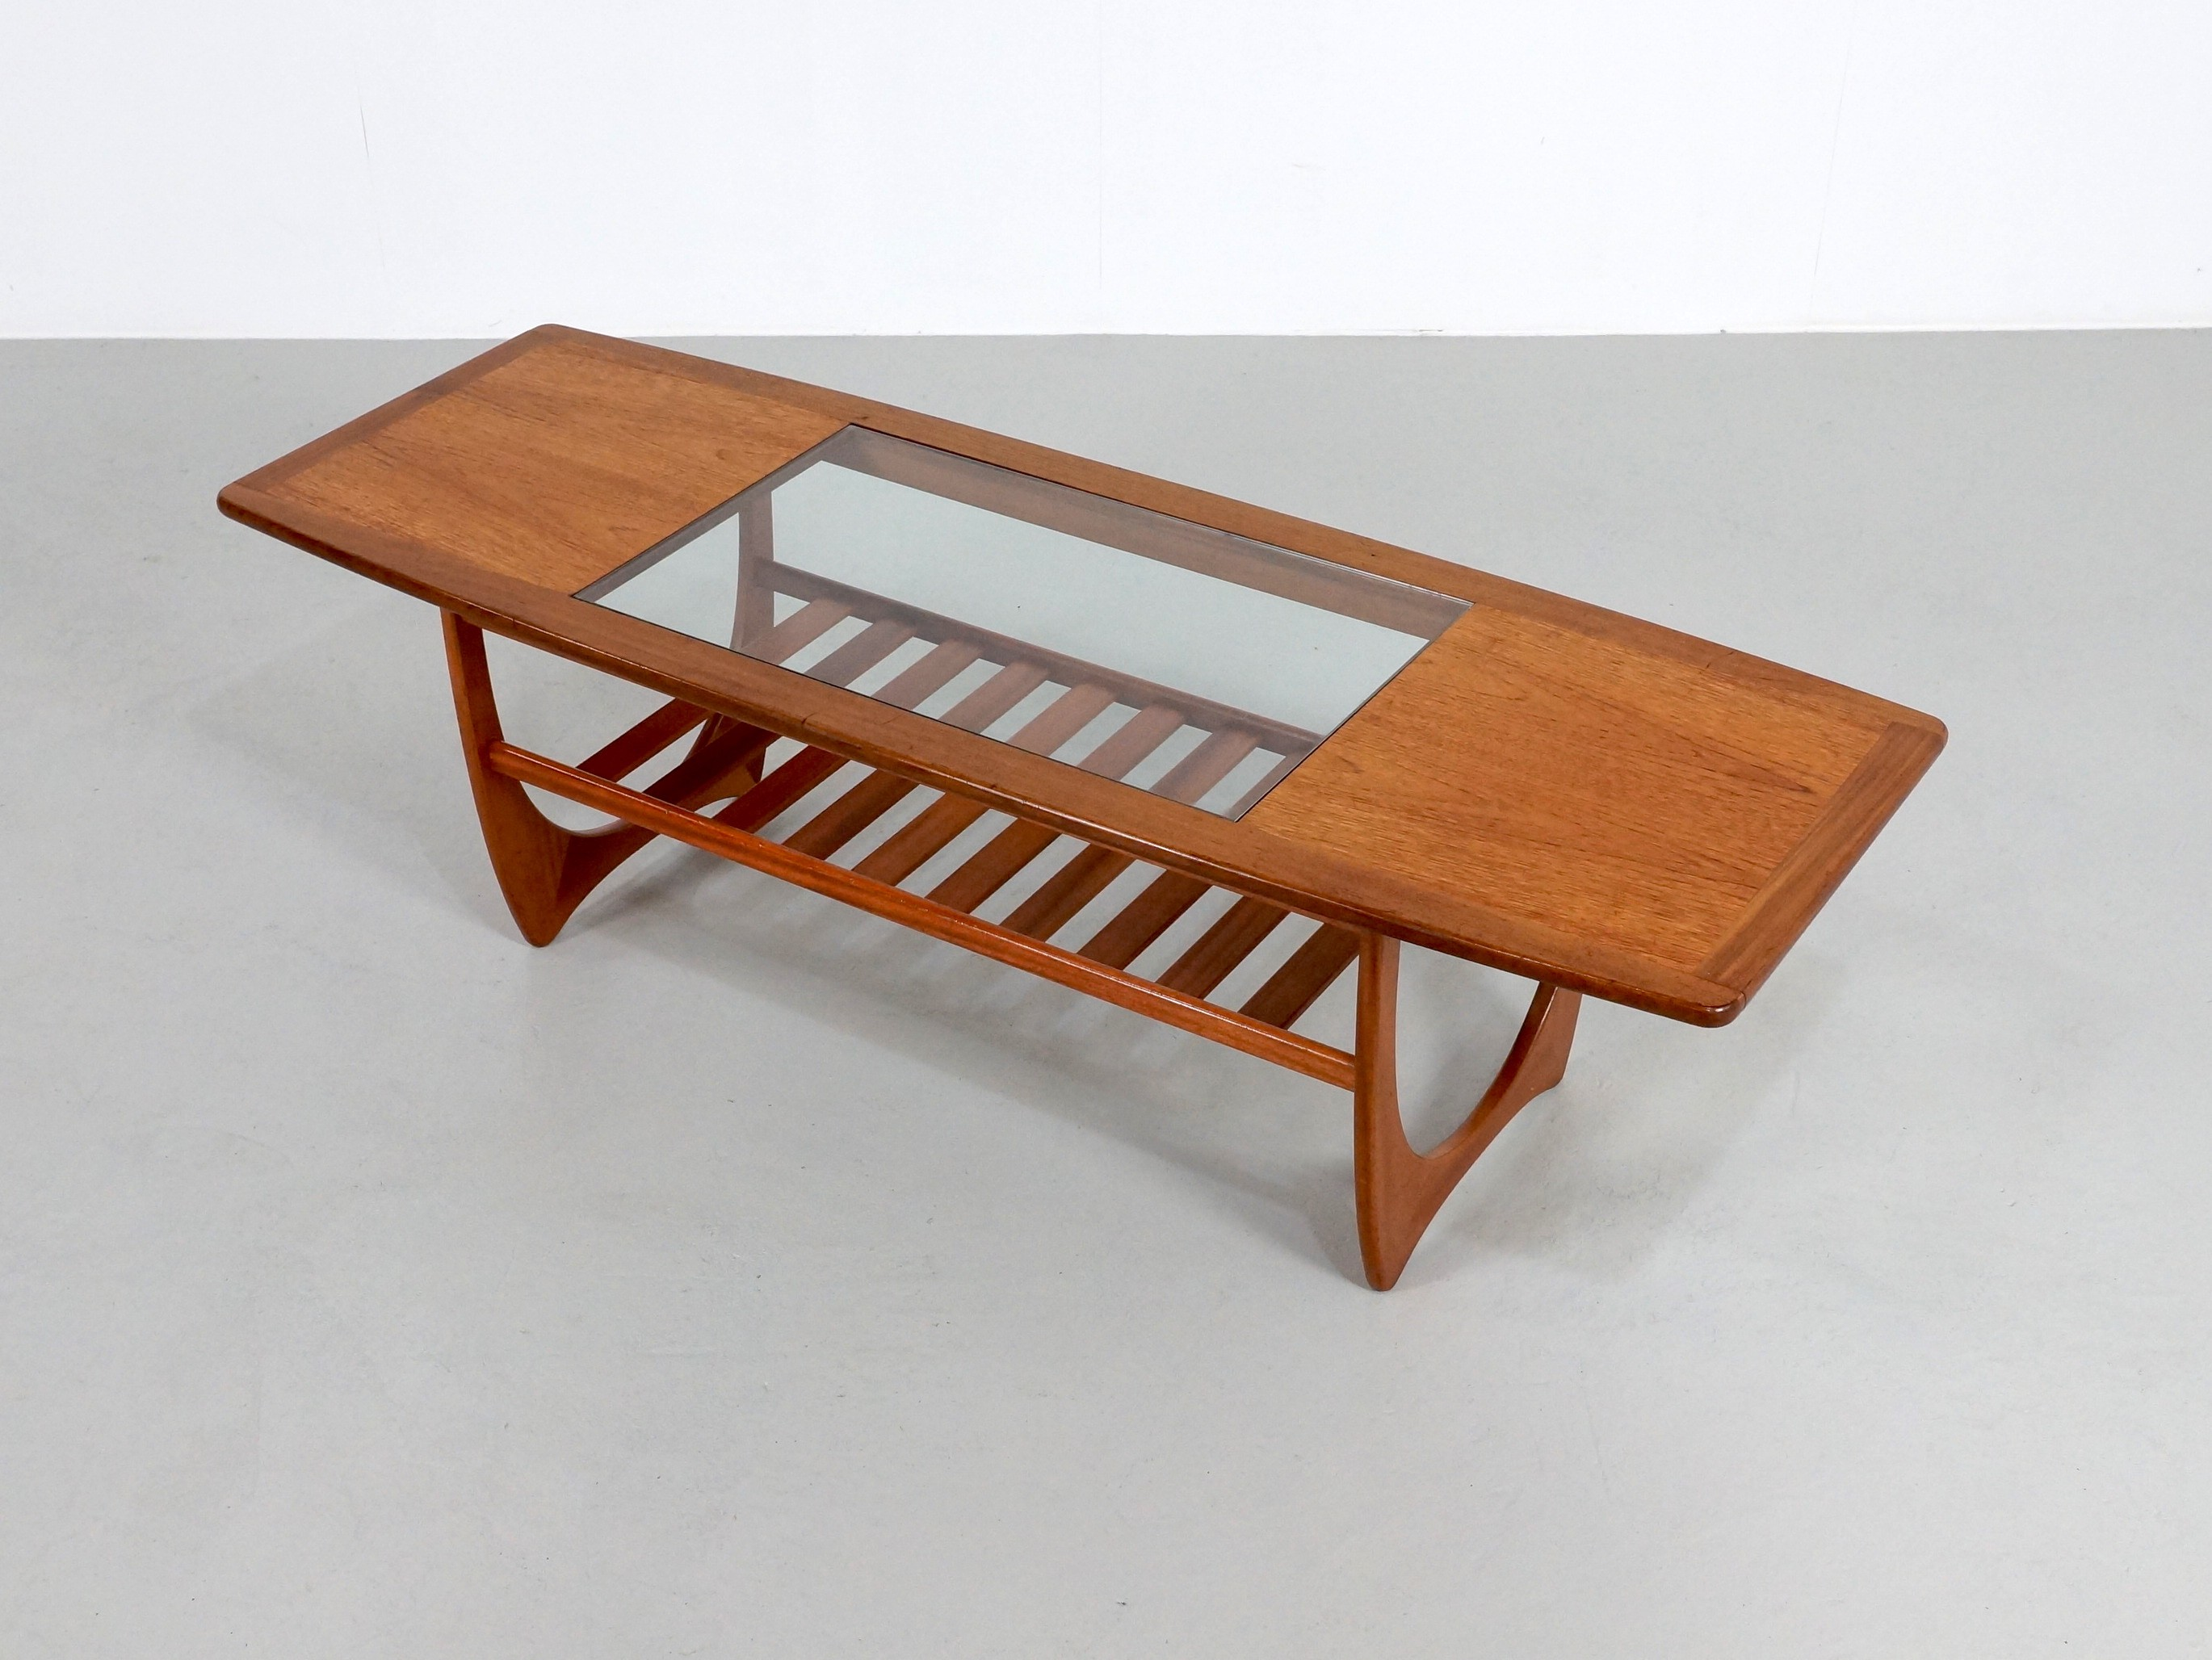 G-Plan teak coffee table - 1960s - Design Market